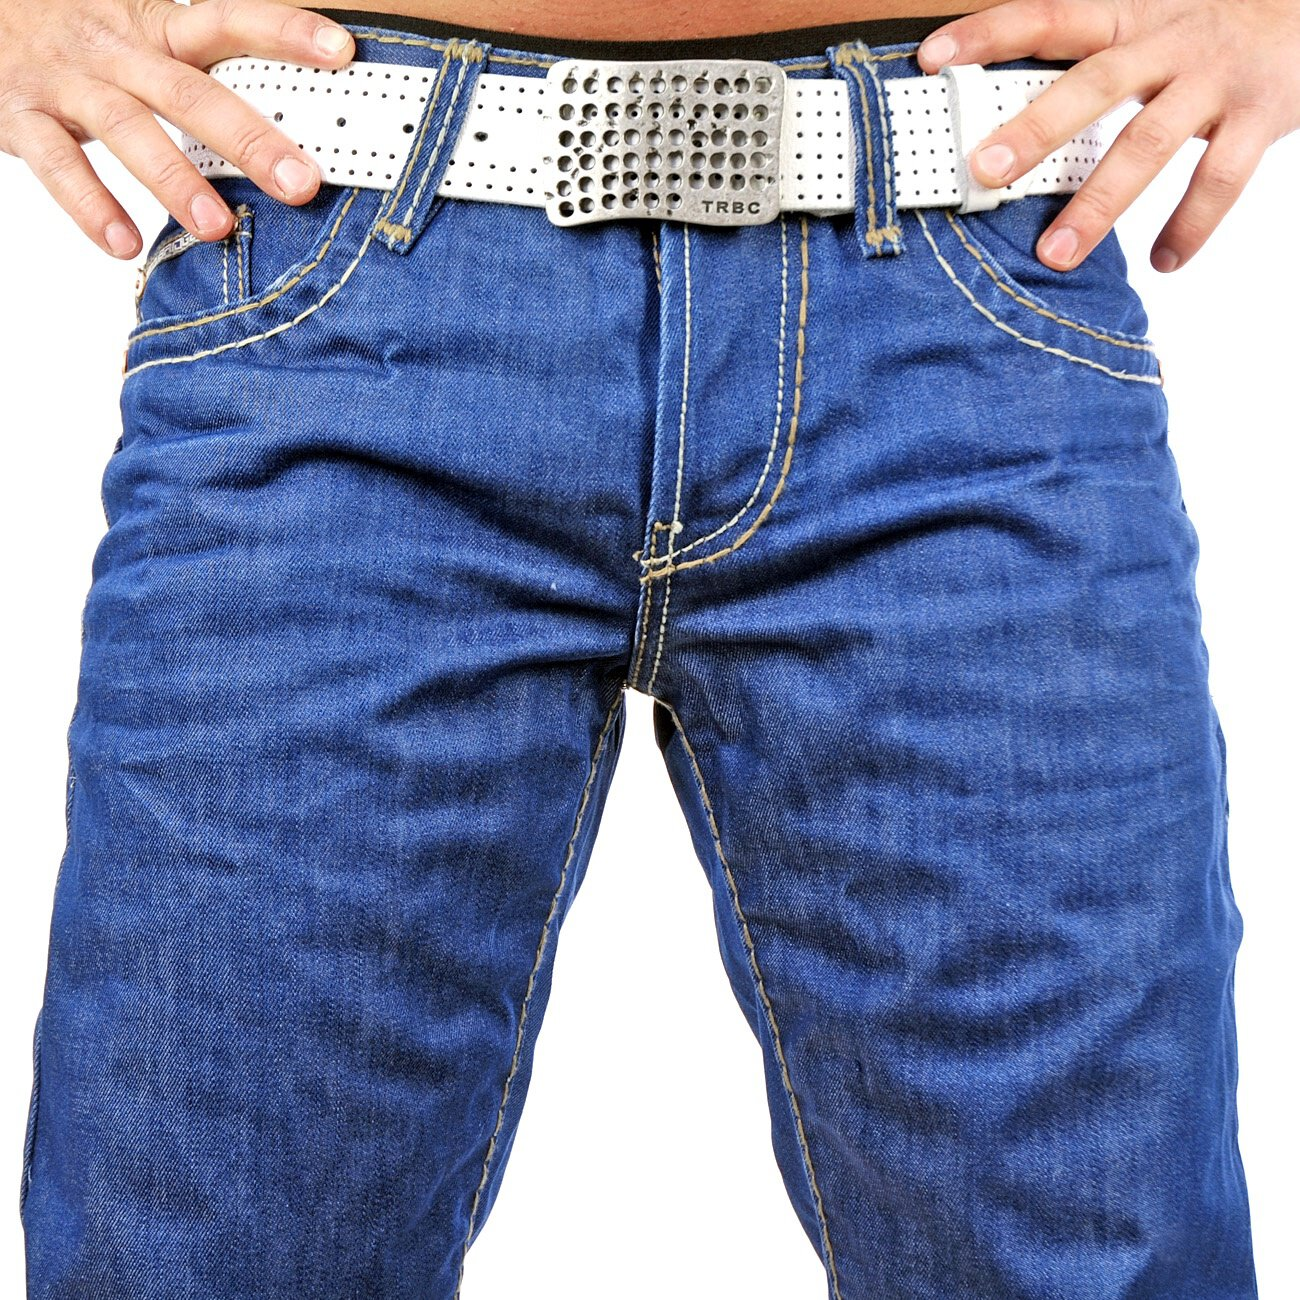 herren jeans blau redbridge dicke naht 144 jeans kaufen. Black Bedroom Furniture Sets. Home Design Ideas